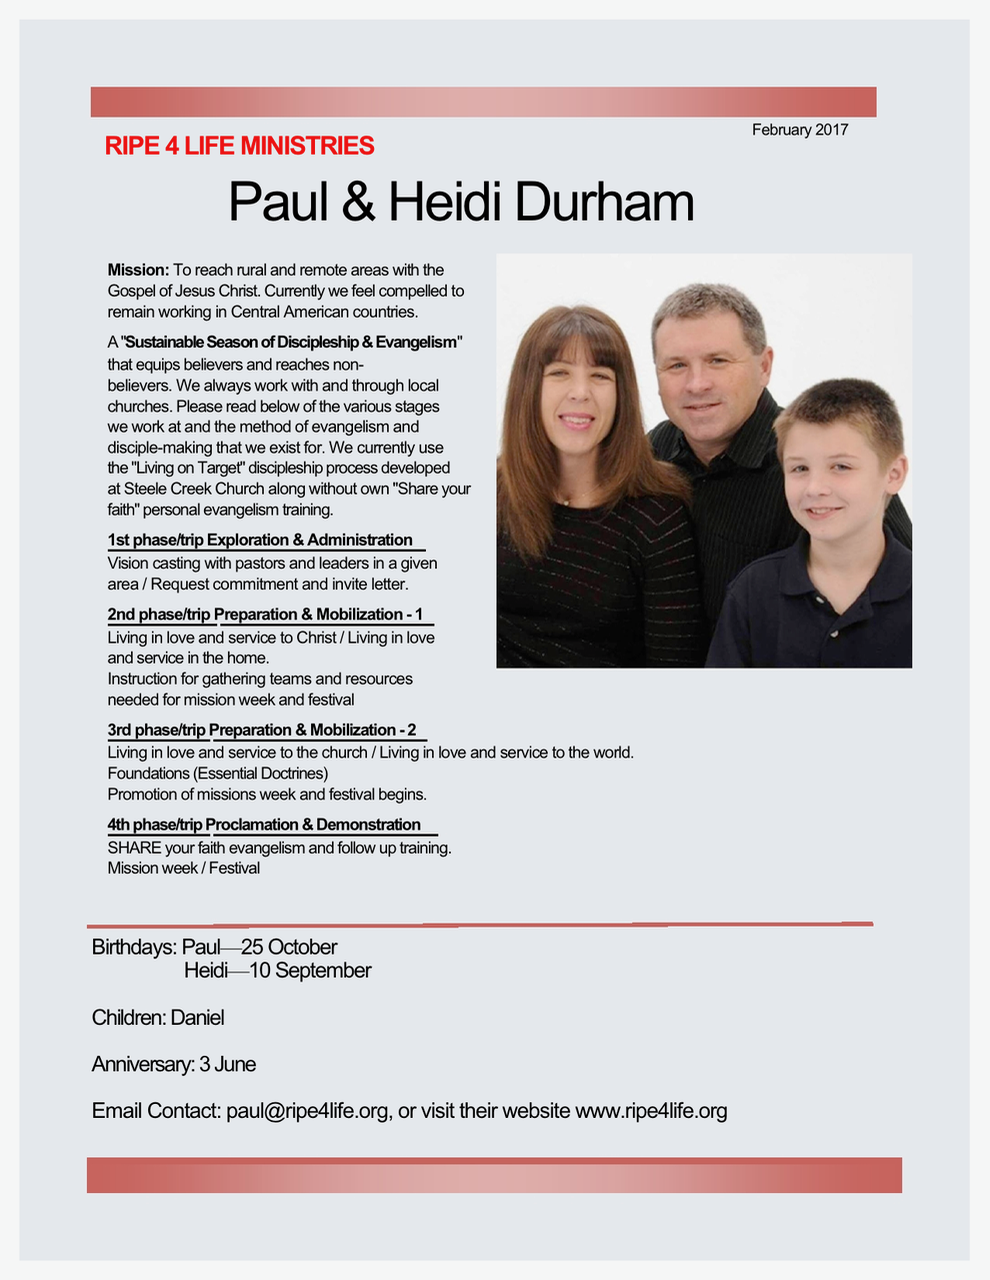 Paul and Heidi Durham